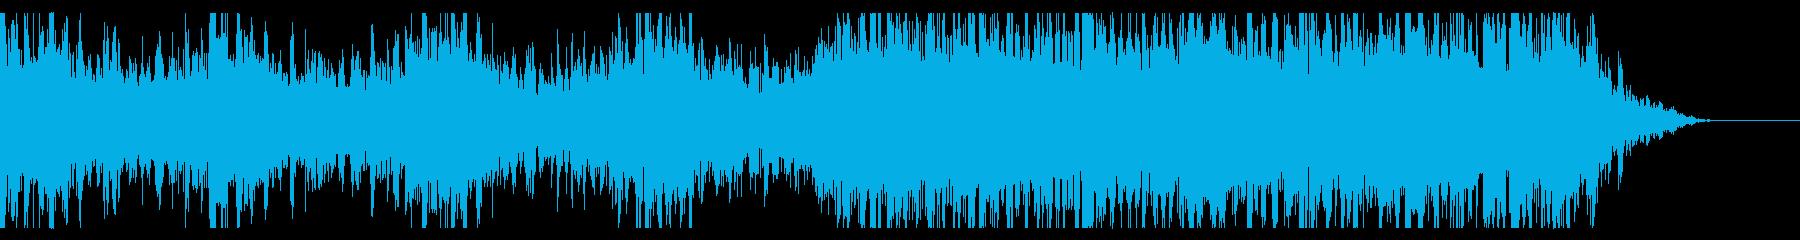 UFOが浮遊している音の再生済みの波形